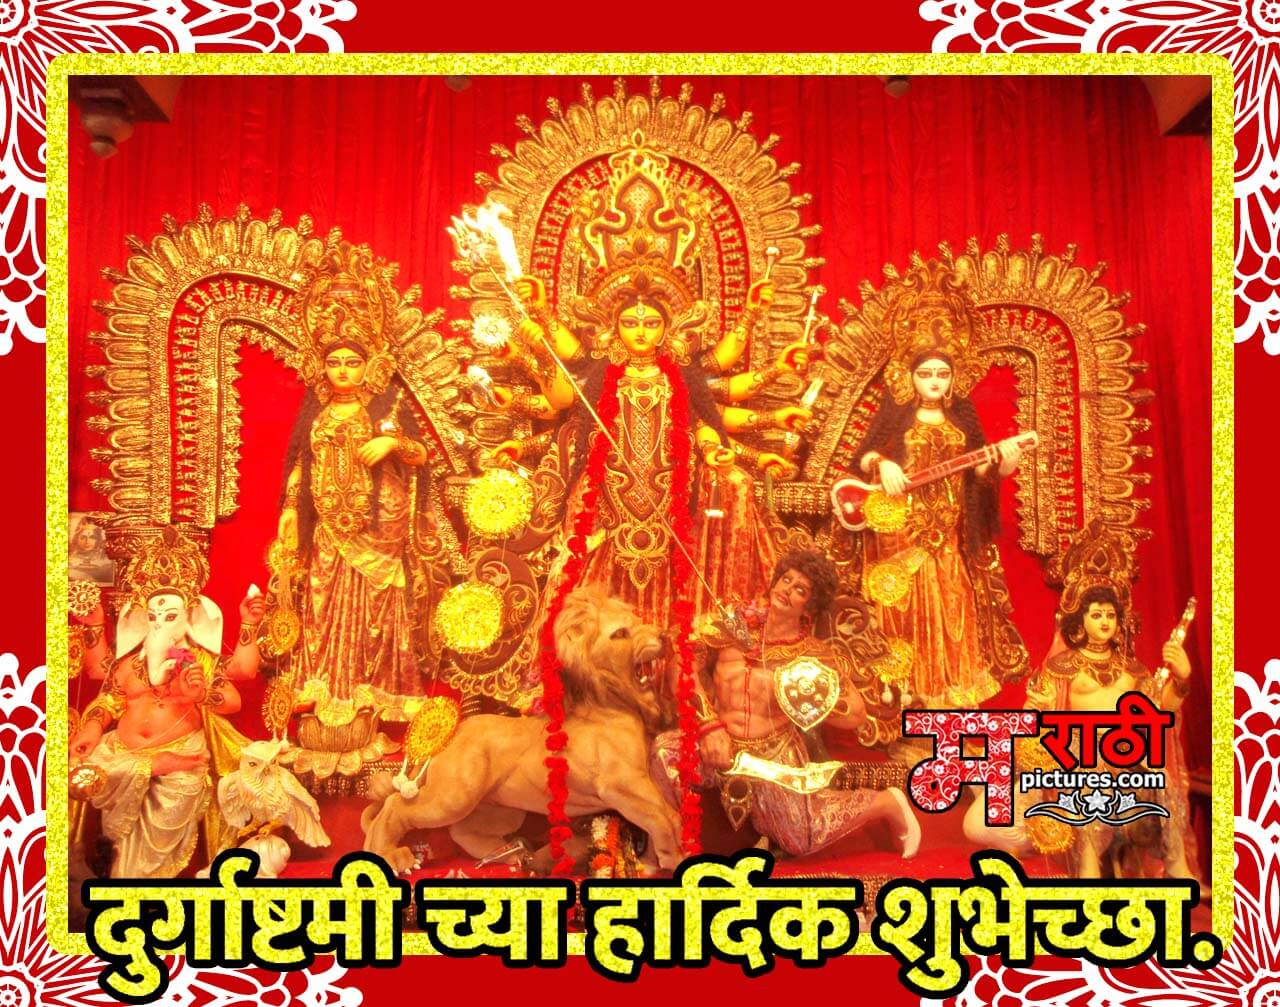 Durga Ashtami Chya Hardik Shubhechha - Marathi Pictures ... Vadhdivas Chya Hardik Shubhechha